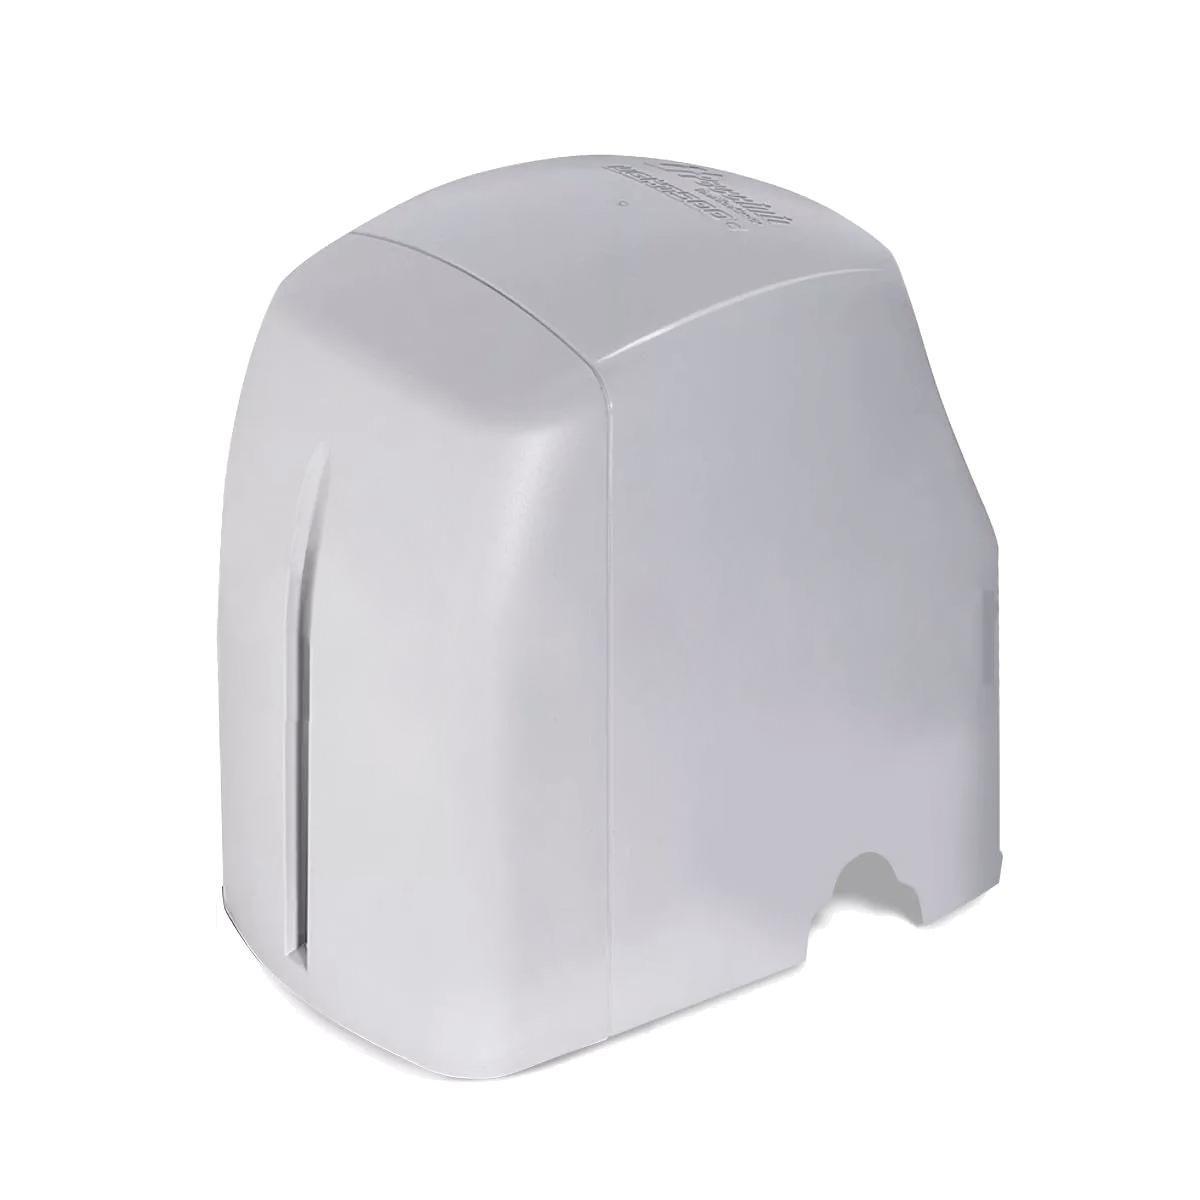 Capa carenagem tampa para motor deslizante Light 500R - Peccinin